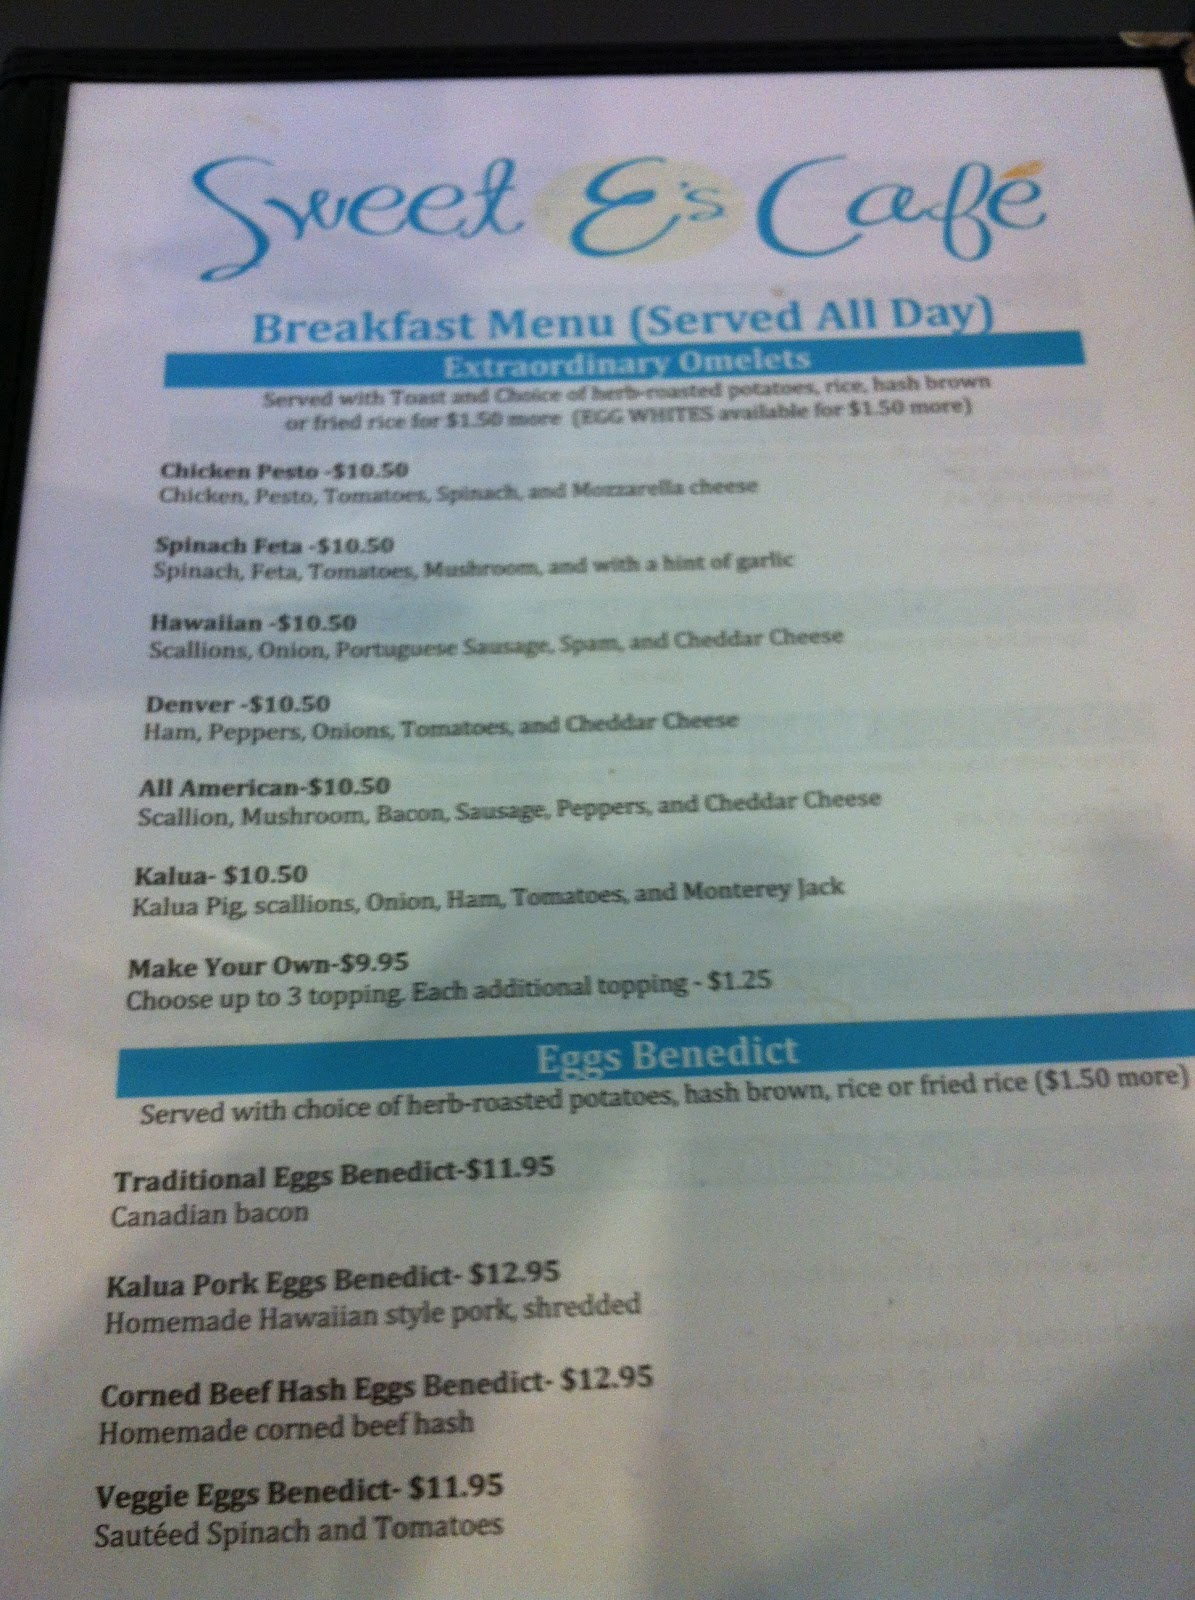 TASTE OF HAWAII: SWEET E\'S CAFE - HONOLULU, HAWAII